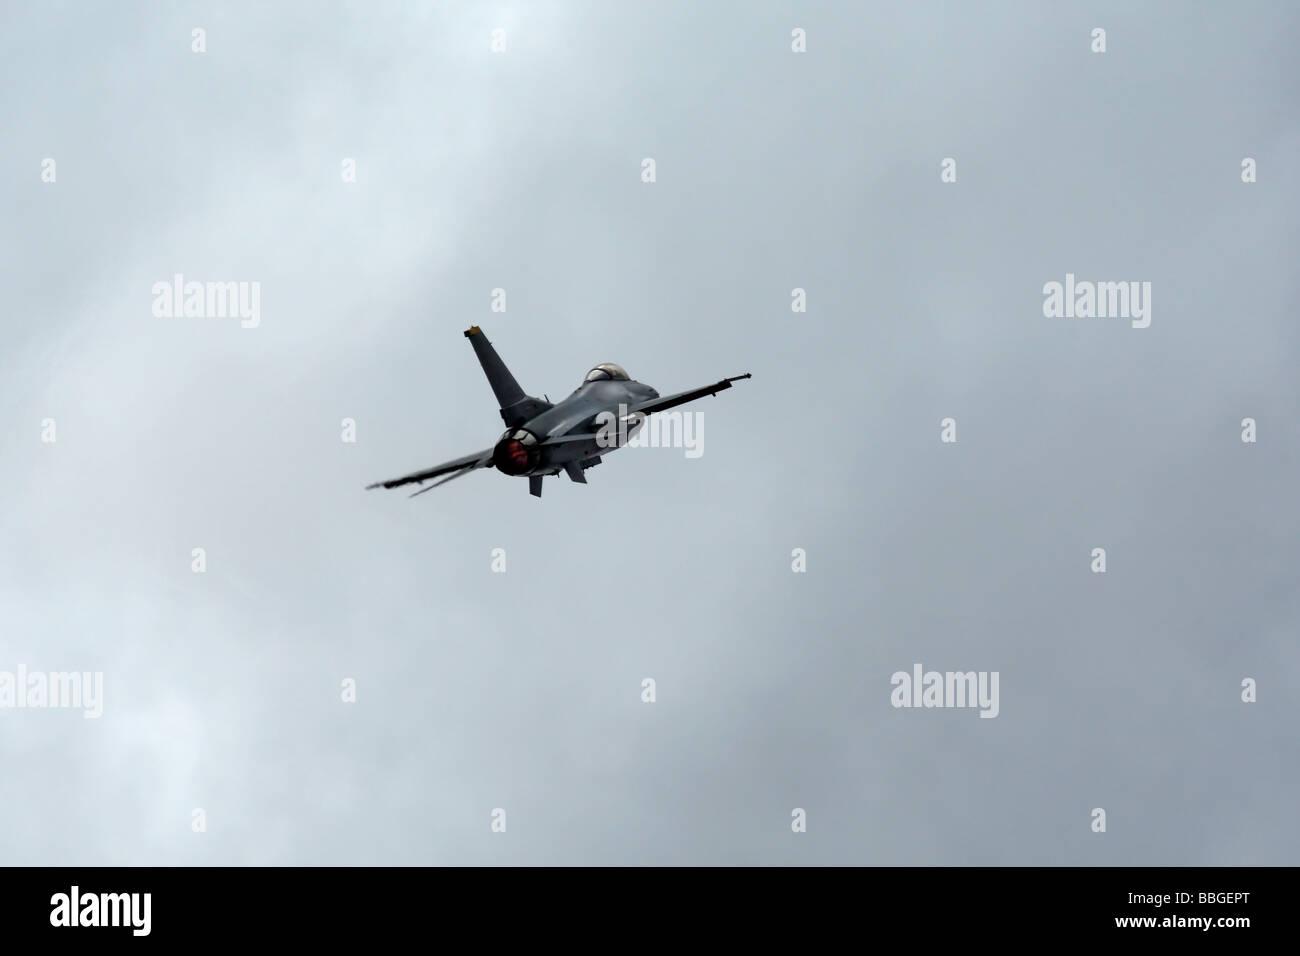 F 16 Fighting Falcon in Flight - Stock Image